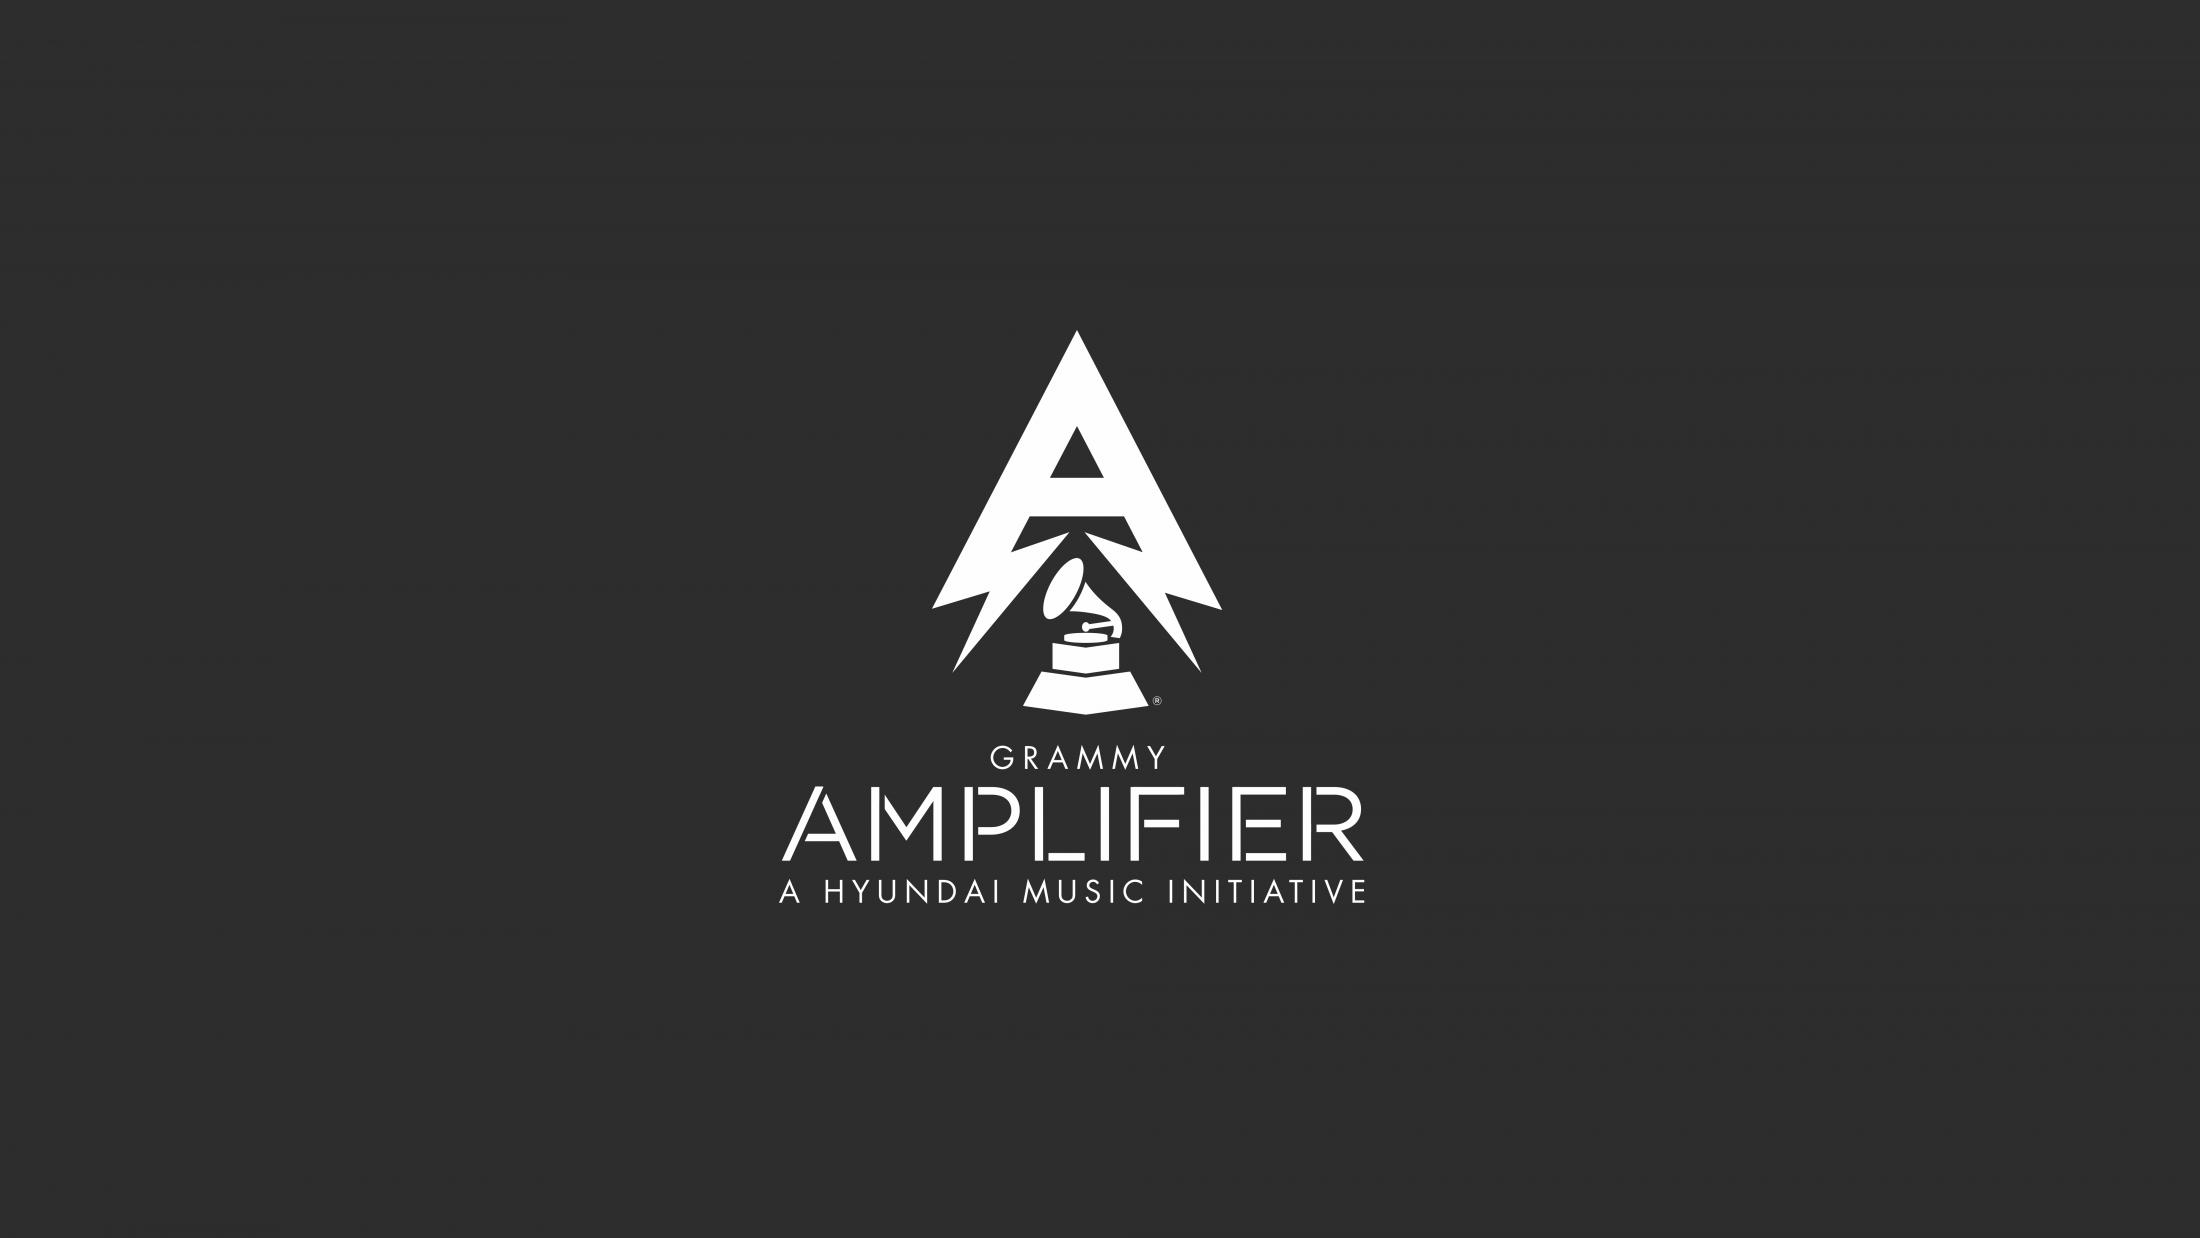 Thumbnail for Hyundai GRAMMY Amplifier Program